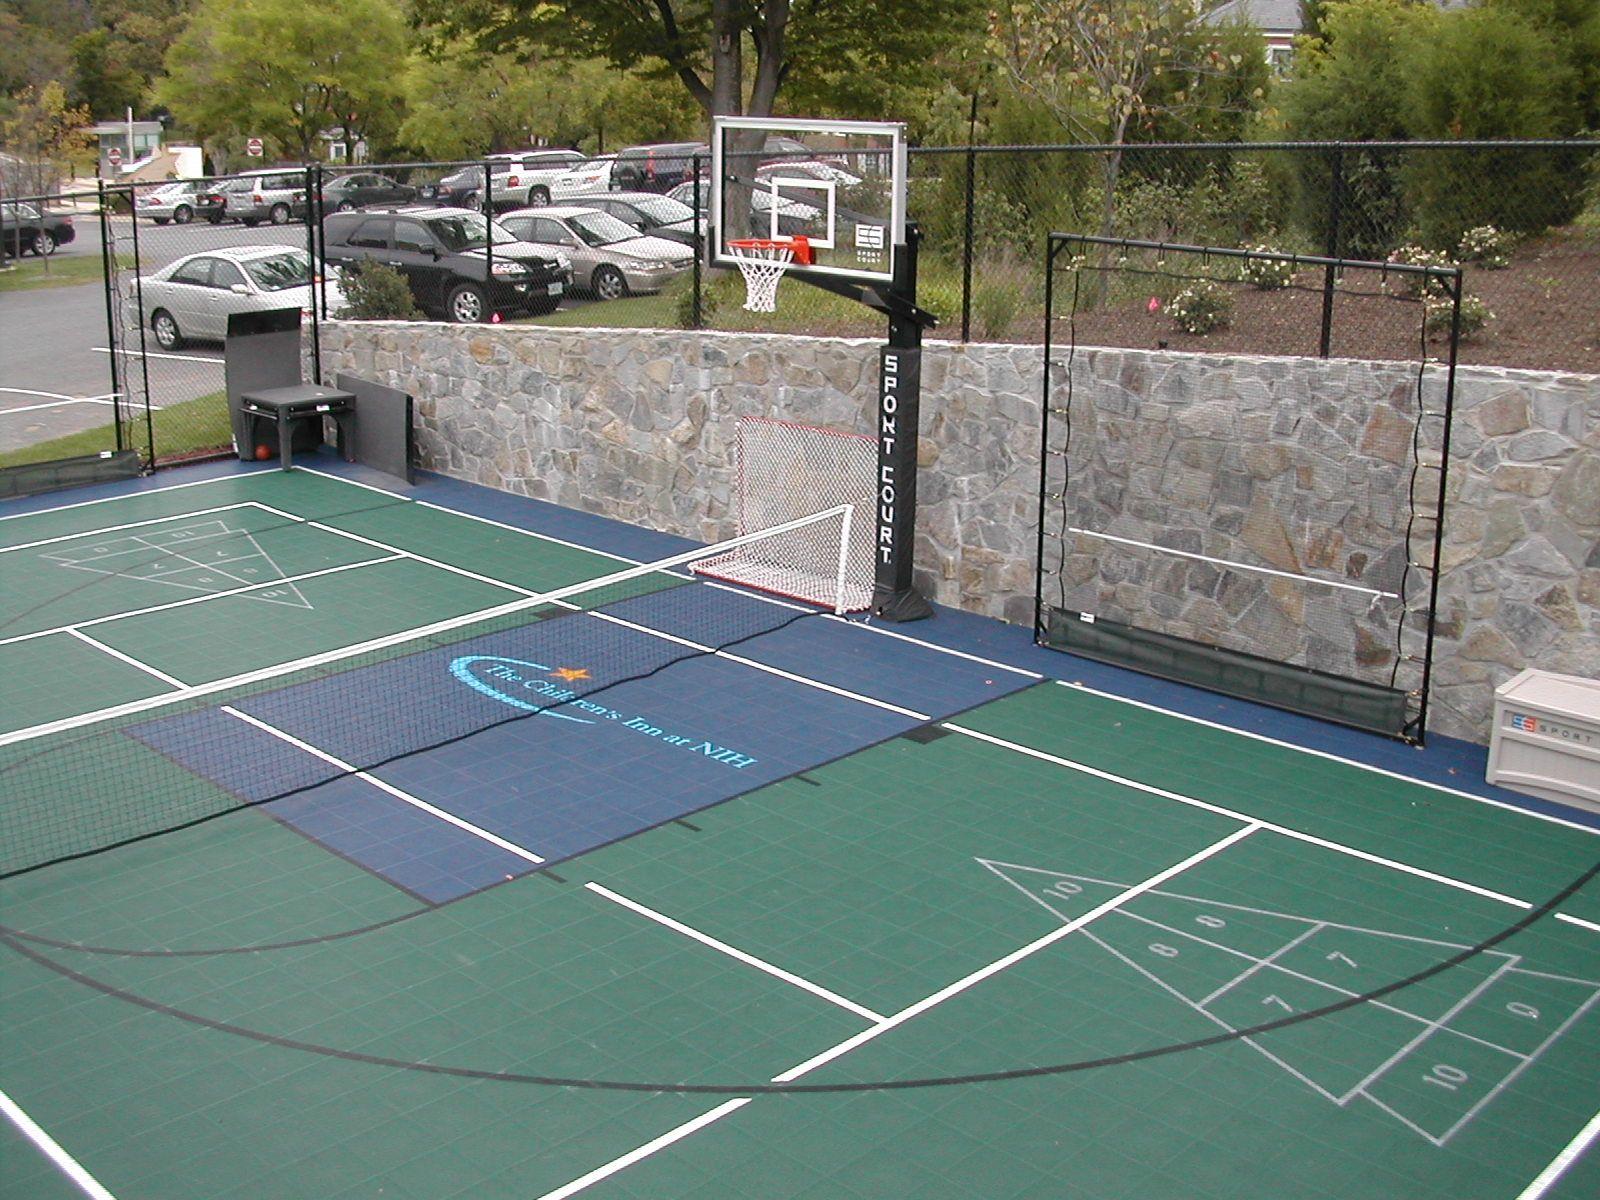 Multisport Court Backyardcourt Backyard Basketball Hopskotch Tennis Basketball Court Backyard Backyard Sports Outdoor Basketball Court